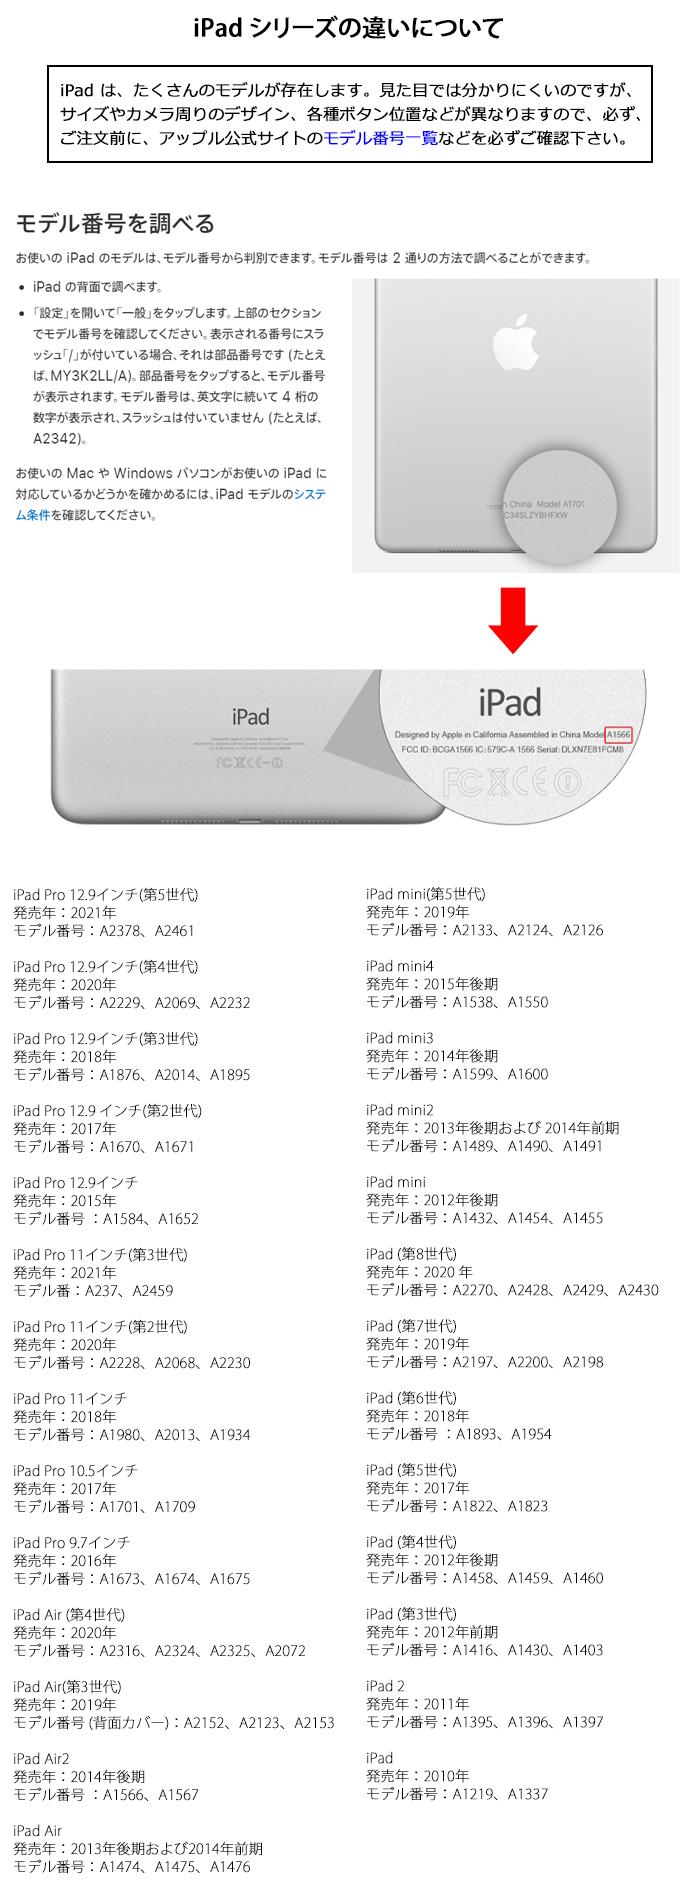 iPad 2018 ケース 2017 Pro 9.7 10.5 12.9 Air2 Air mini mini2 mini3 mini4 カバー iPadケース iPad5 iPad6 耐衝撃 スタンド 送料無料